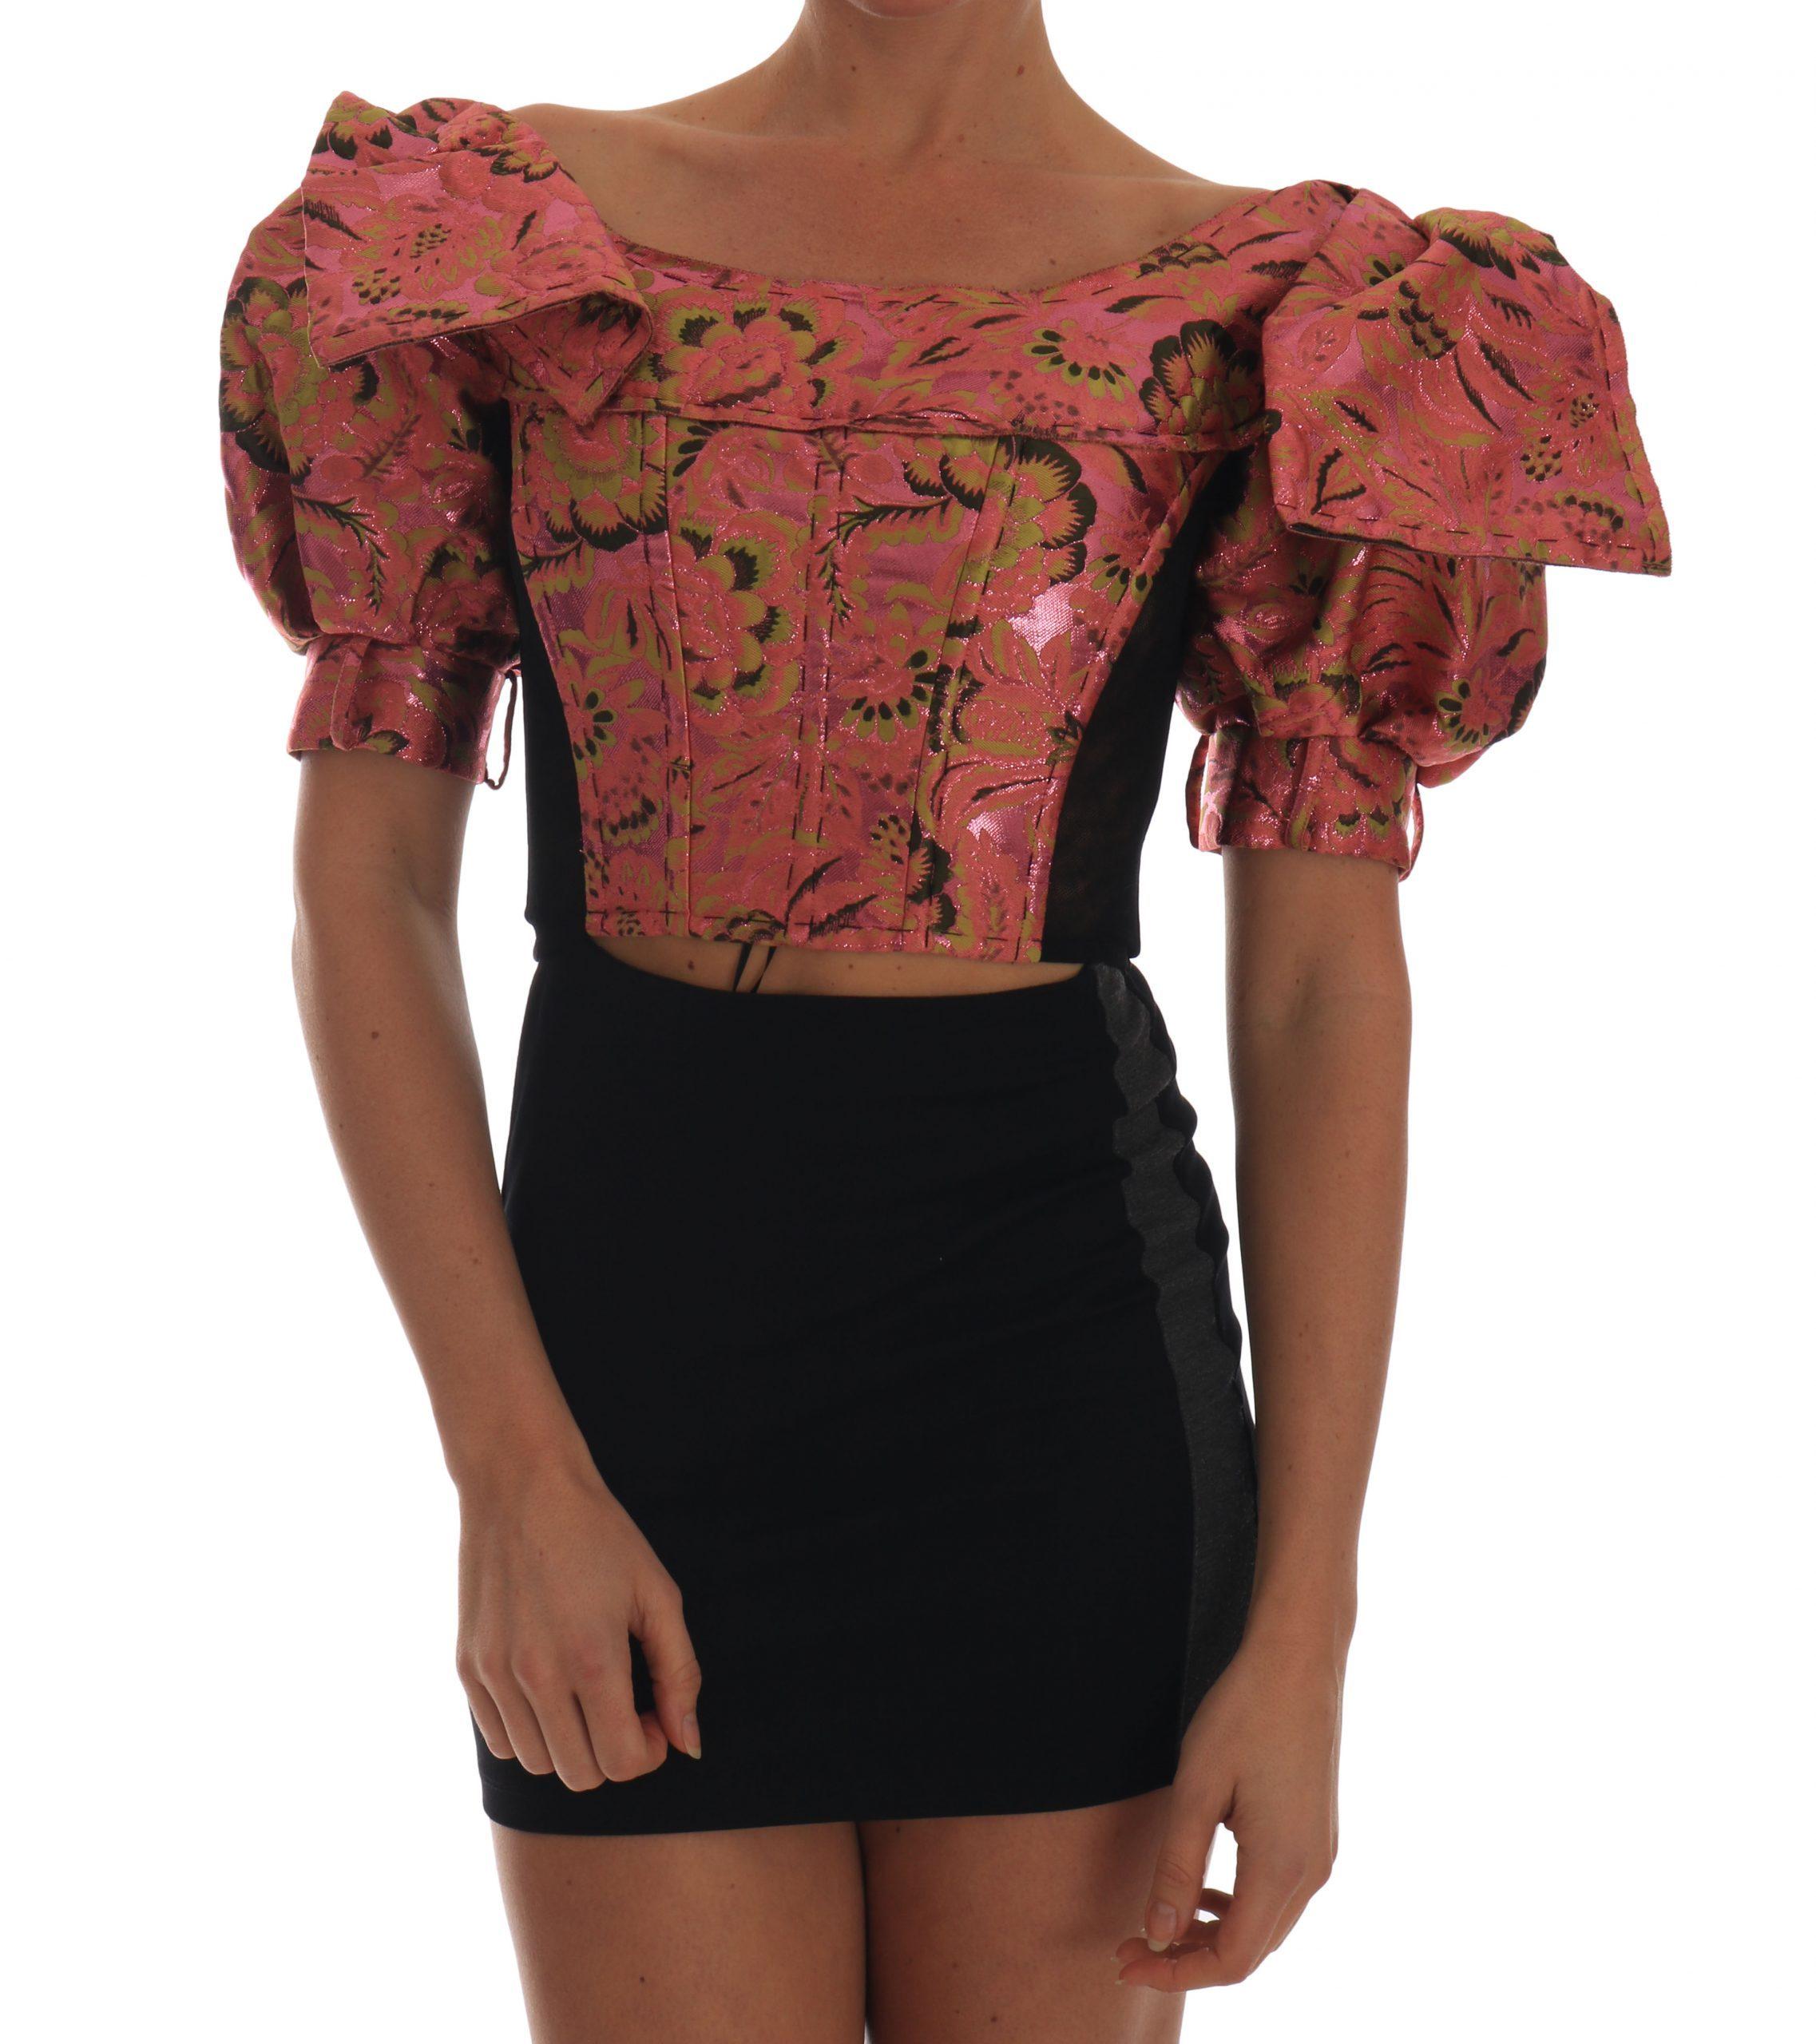 Dolce & Gabbana Women's Puff Sleeve Brocade Top Pink TSH1912 - IT38|XS